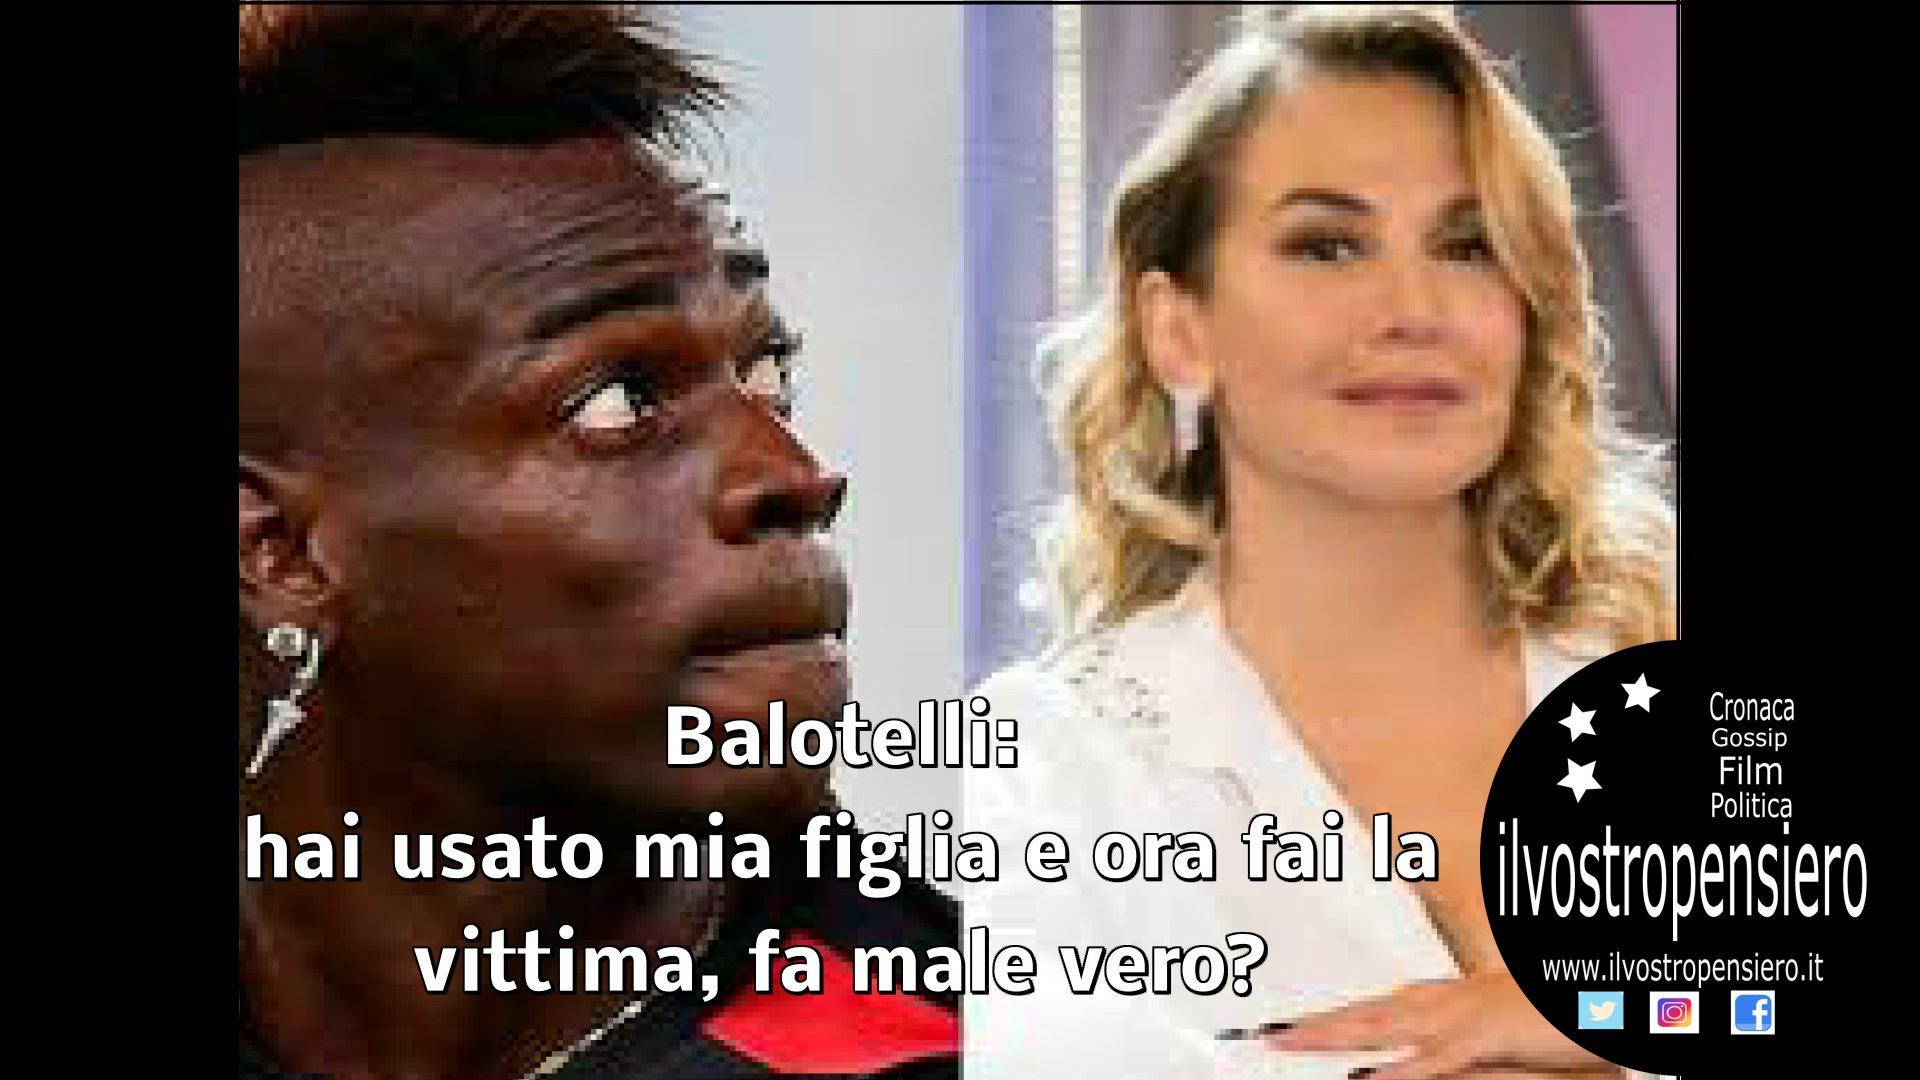 Mario Balotelli dedica una storia su Instagram contro Barbara D'Urso